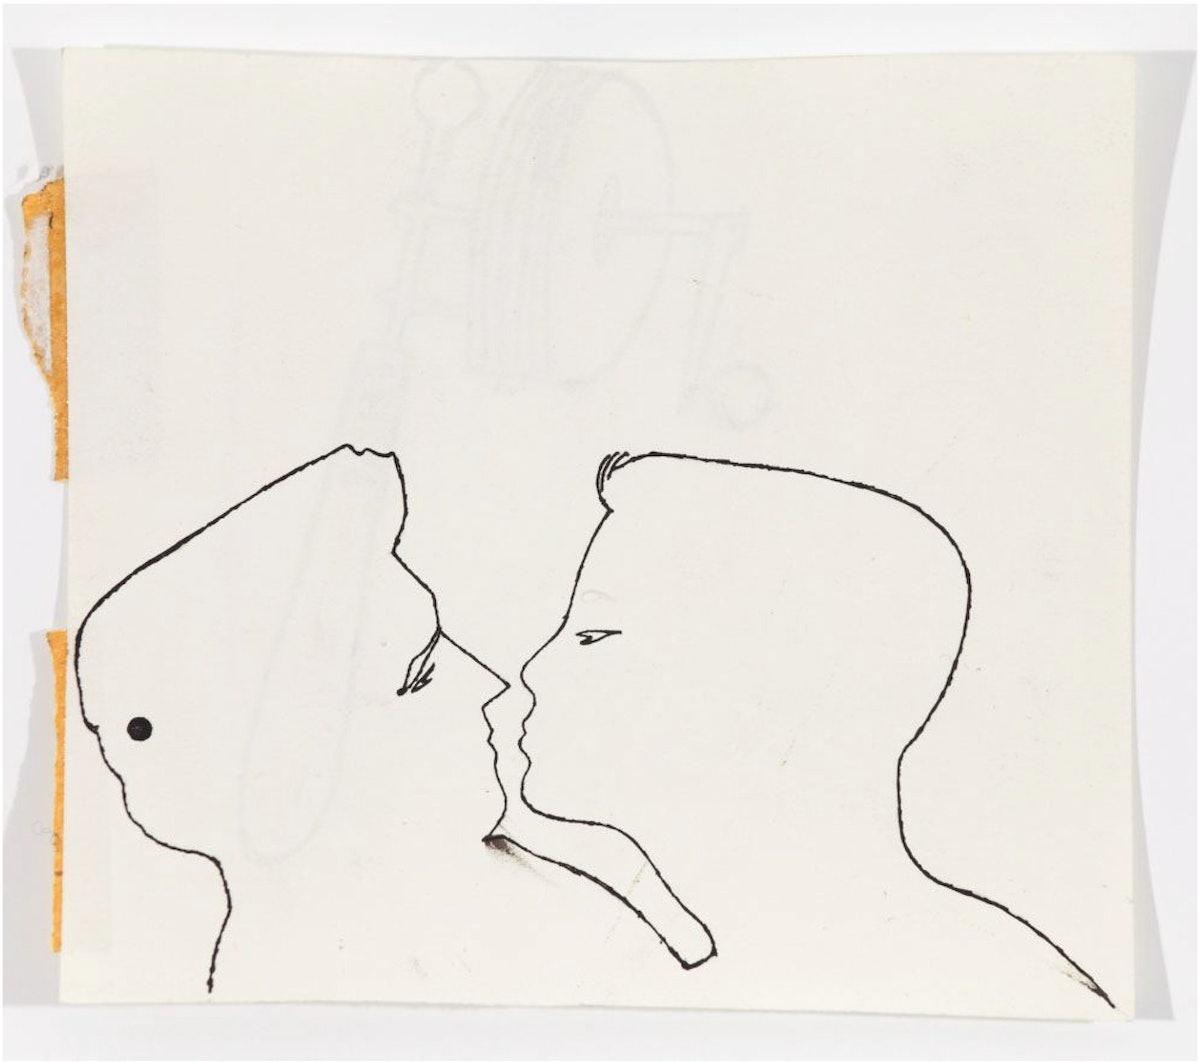 Warhol_Andy_TwoMaleHeadsFacetoFace,Outline_AK10863.jpg